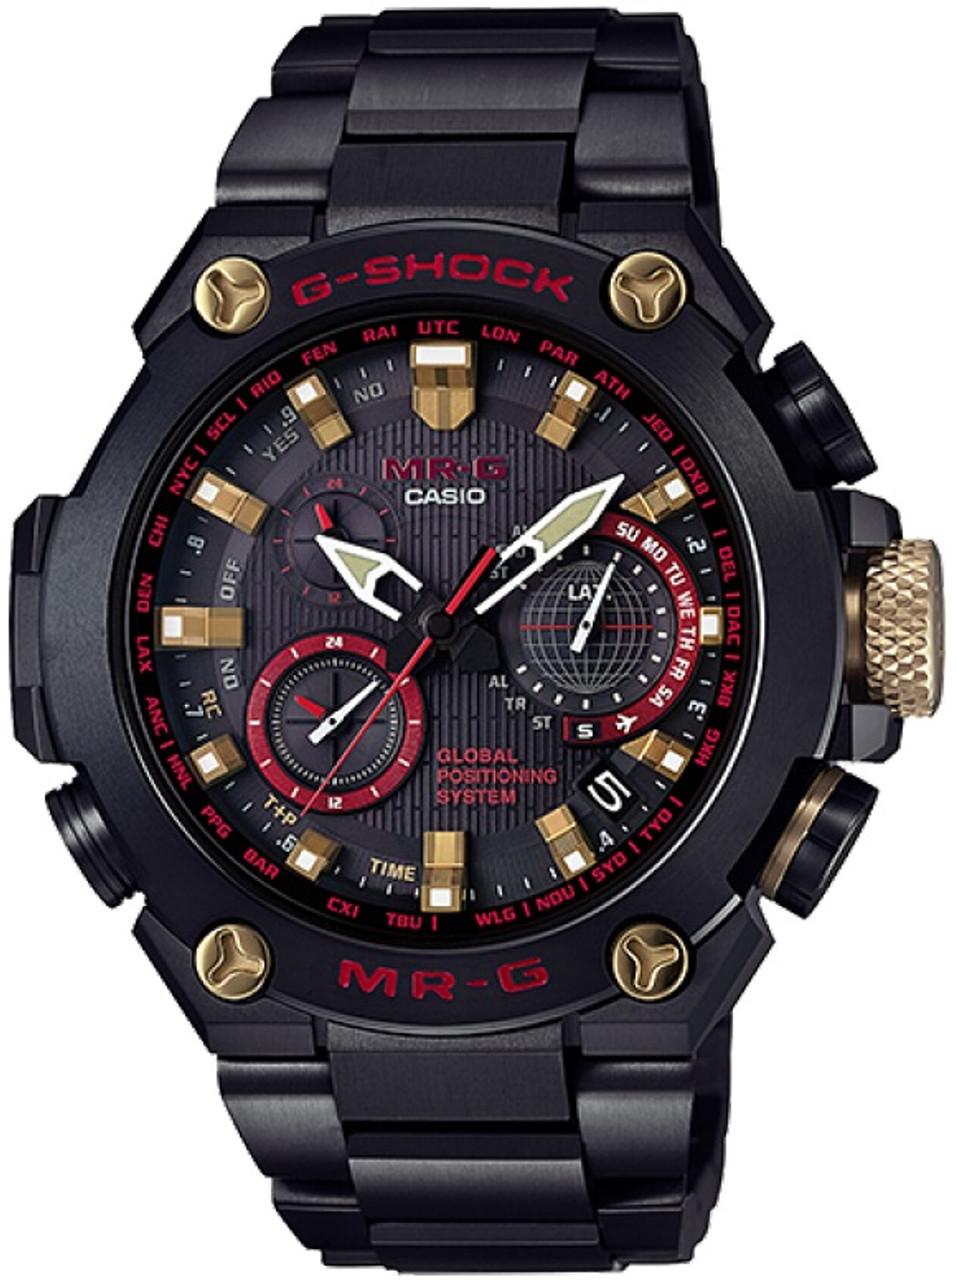 G-Shock MRG-G1000B-1A4JR Akazonae Red Gold